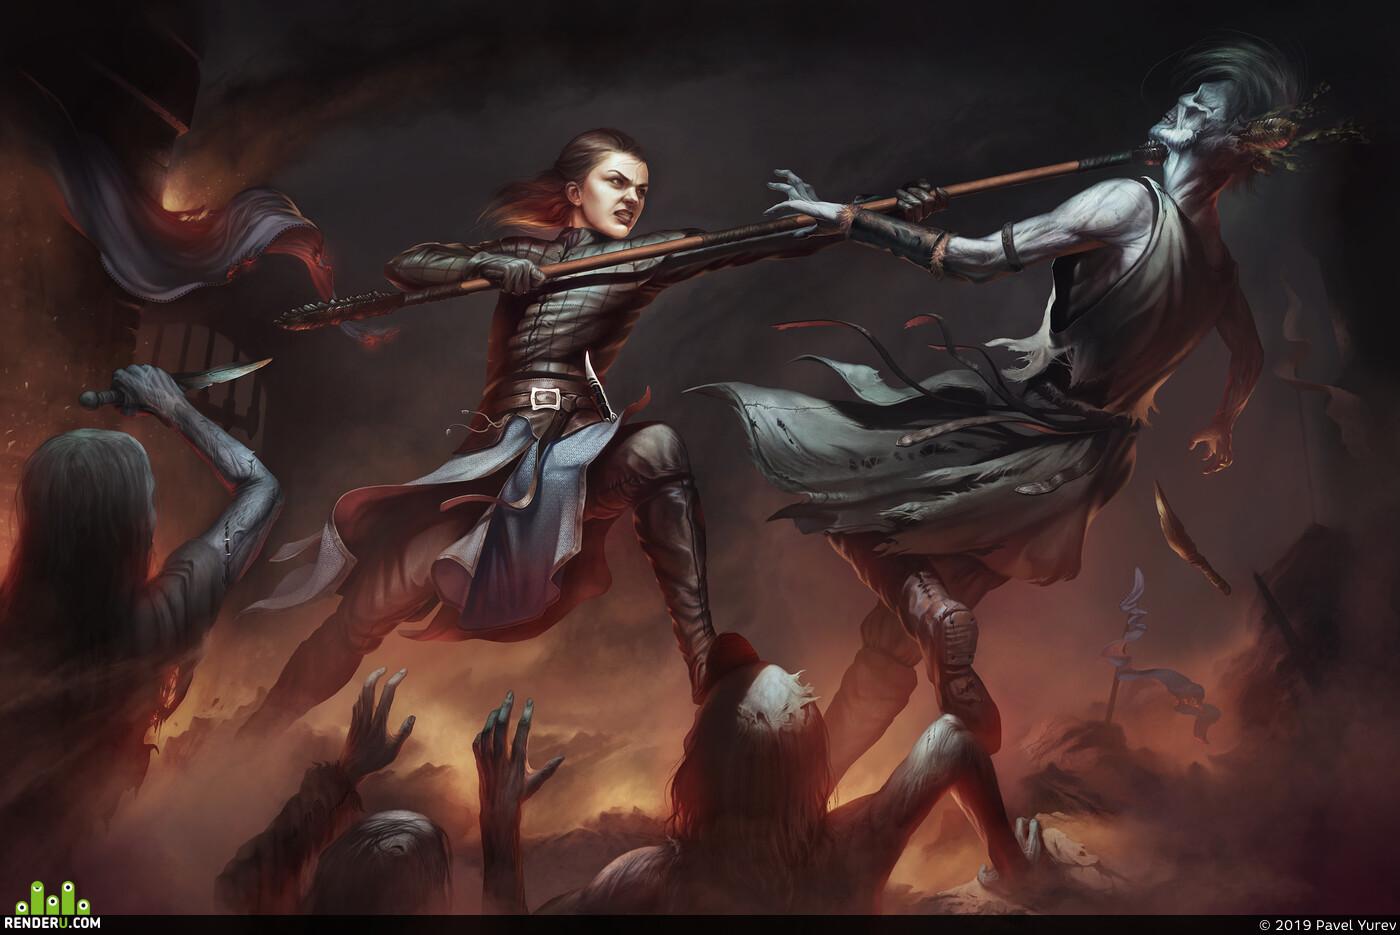 Game of Thrones, White walkers, arya stark